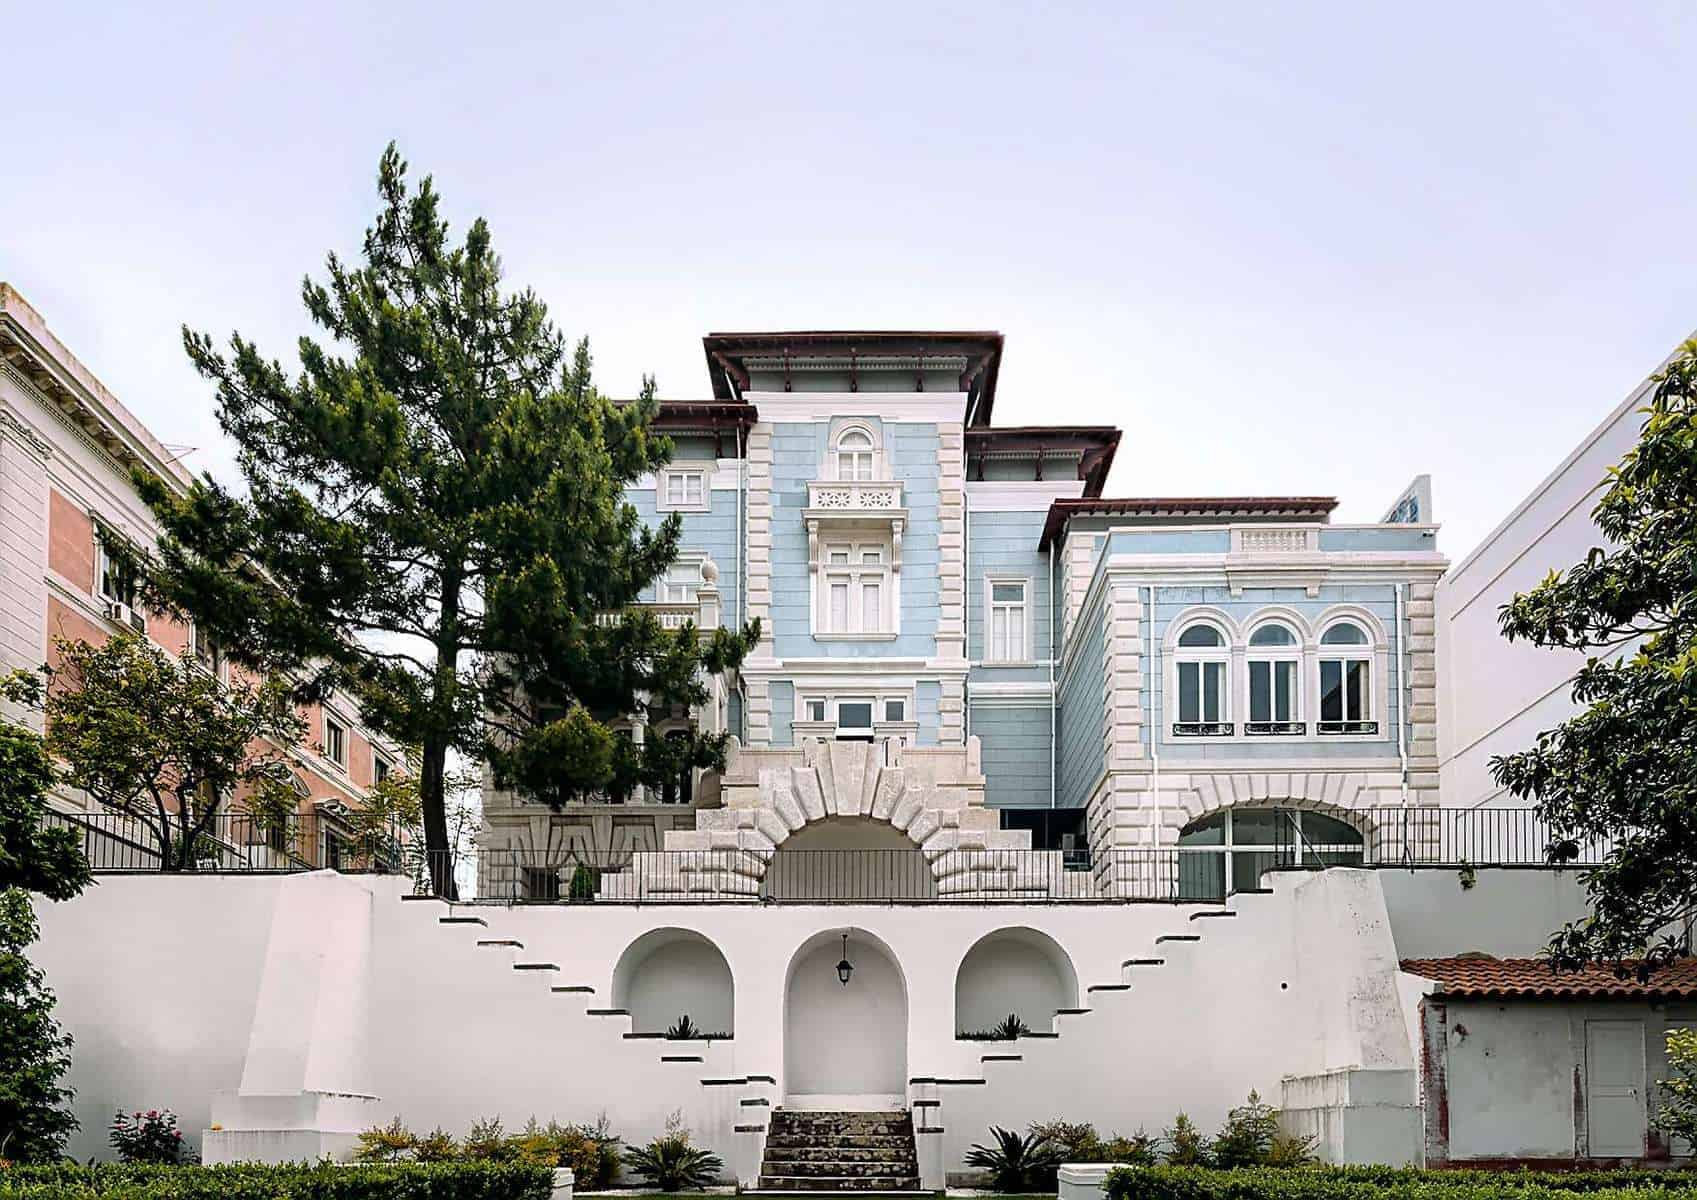 Virtvs Palace - Casa da Comida